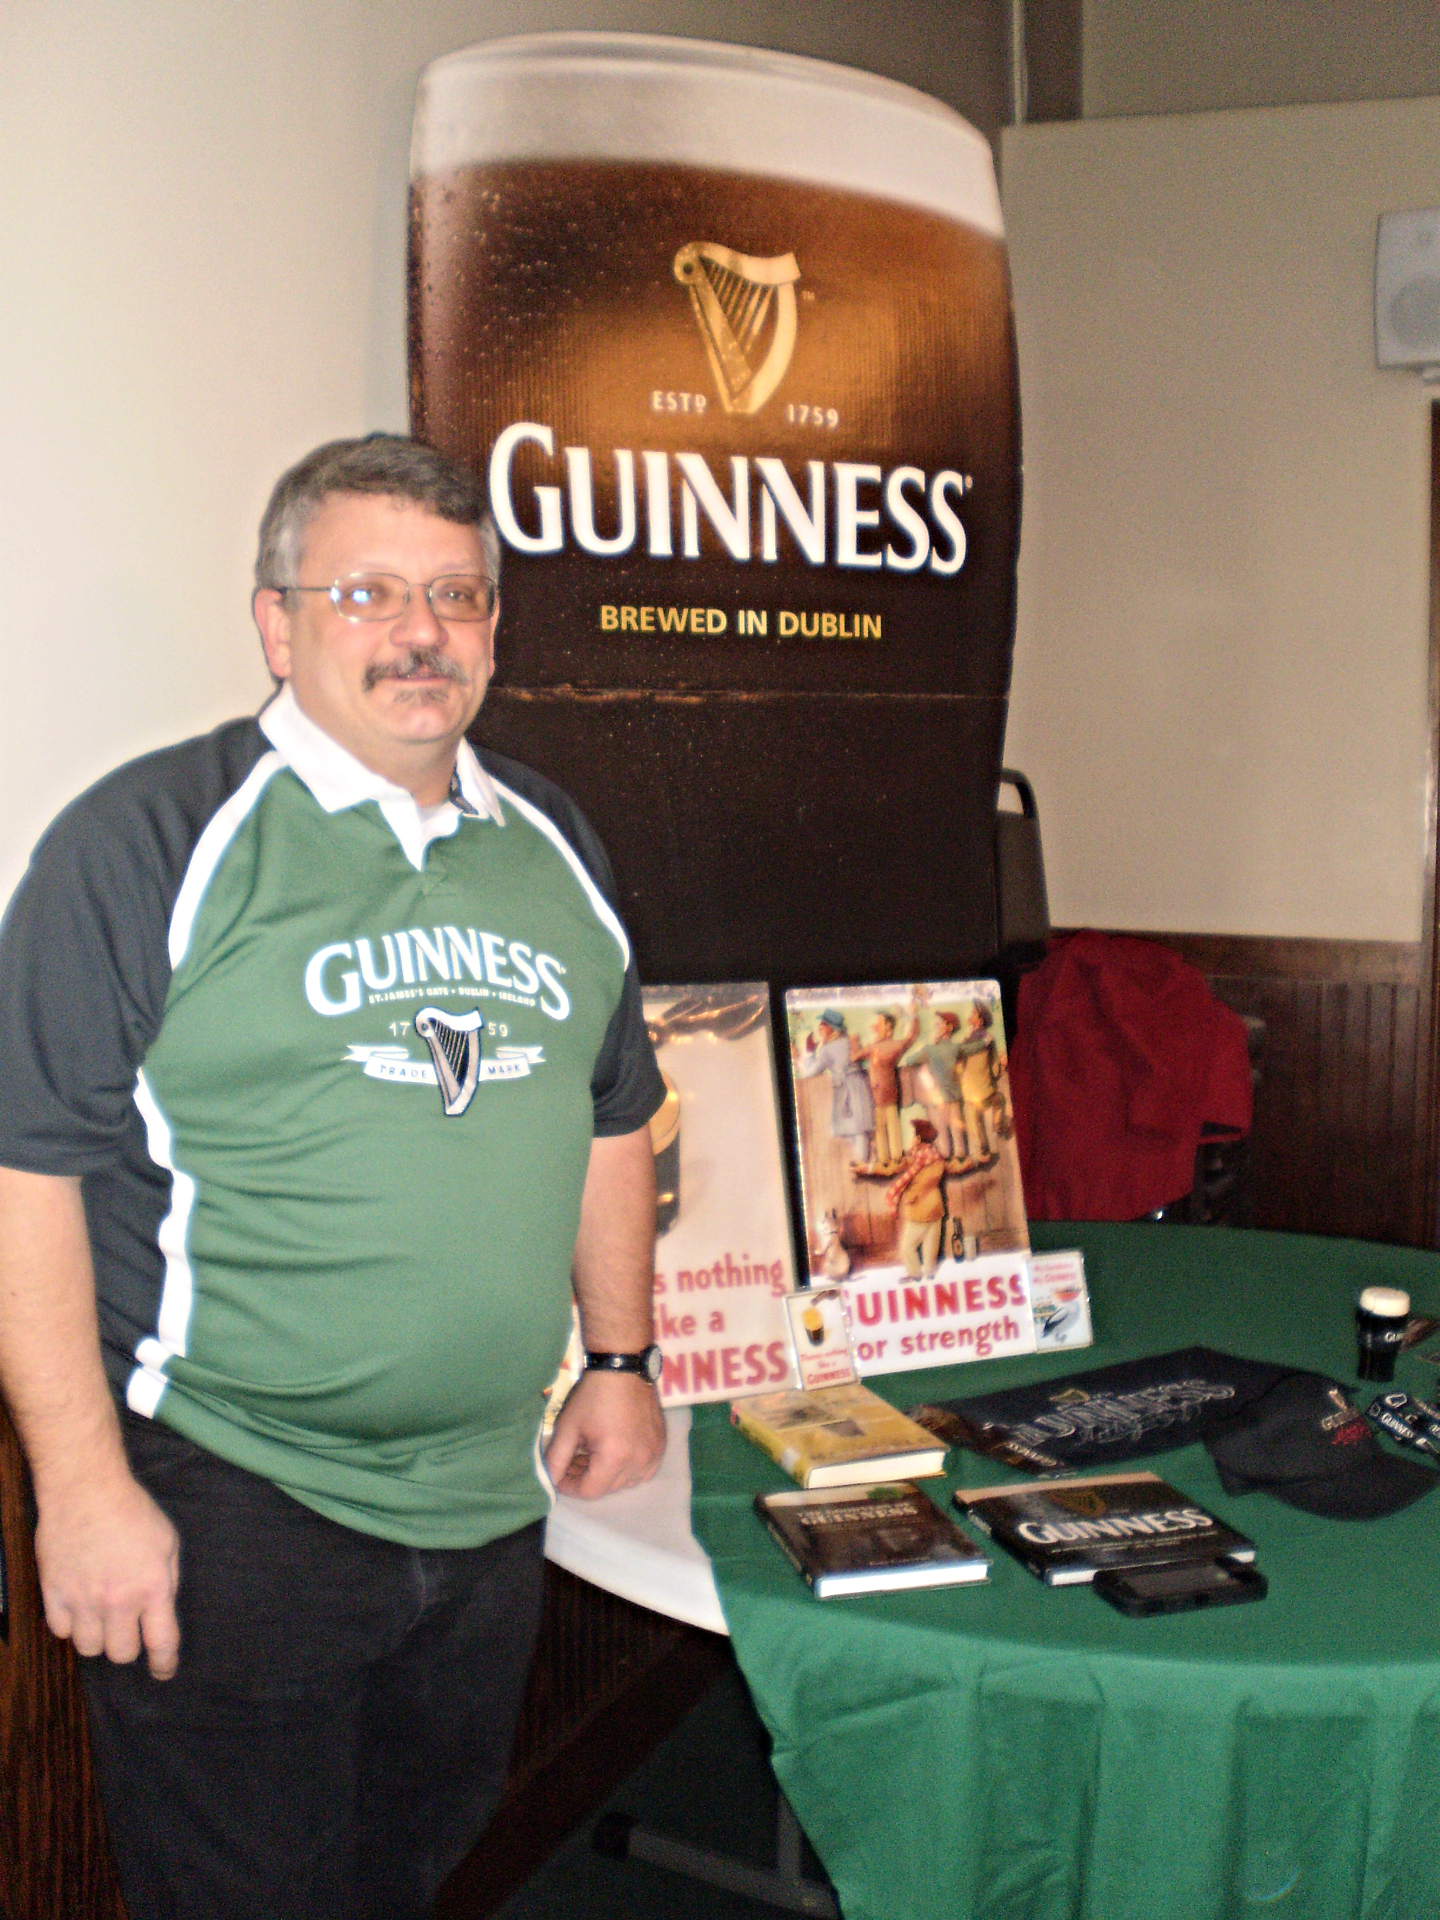 Guinness is good!